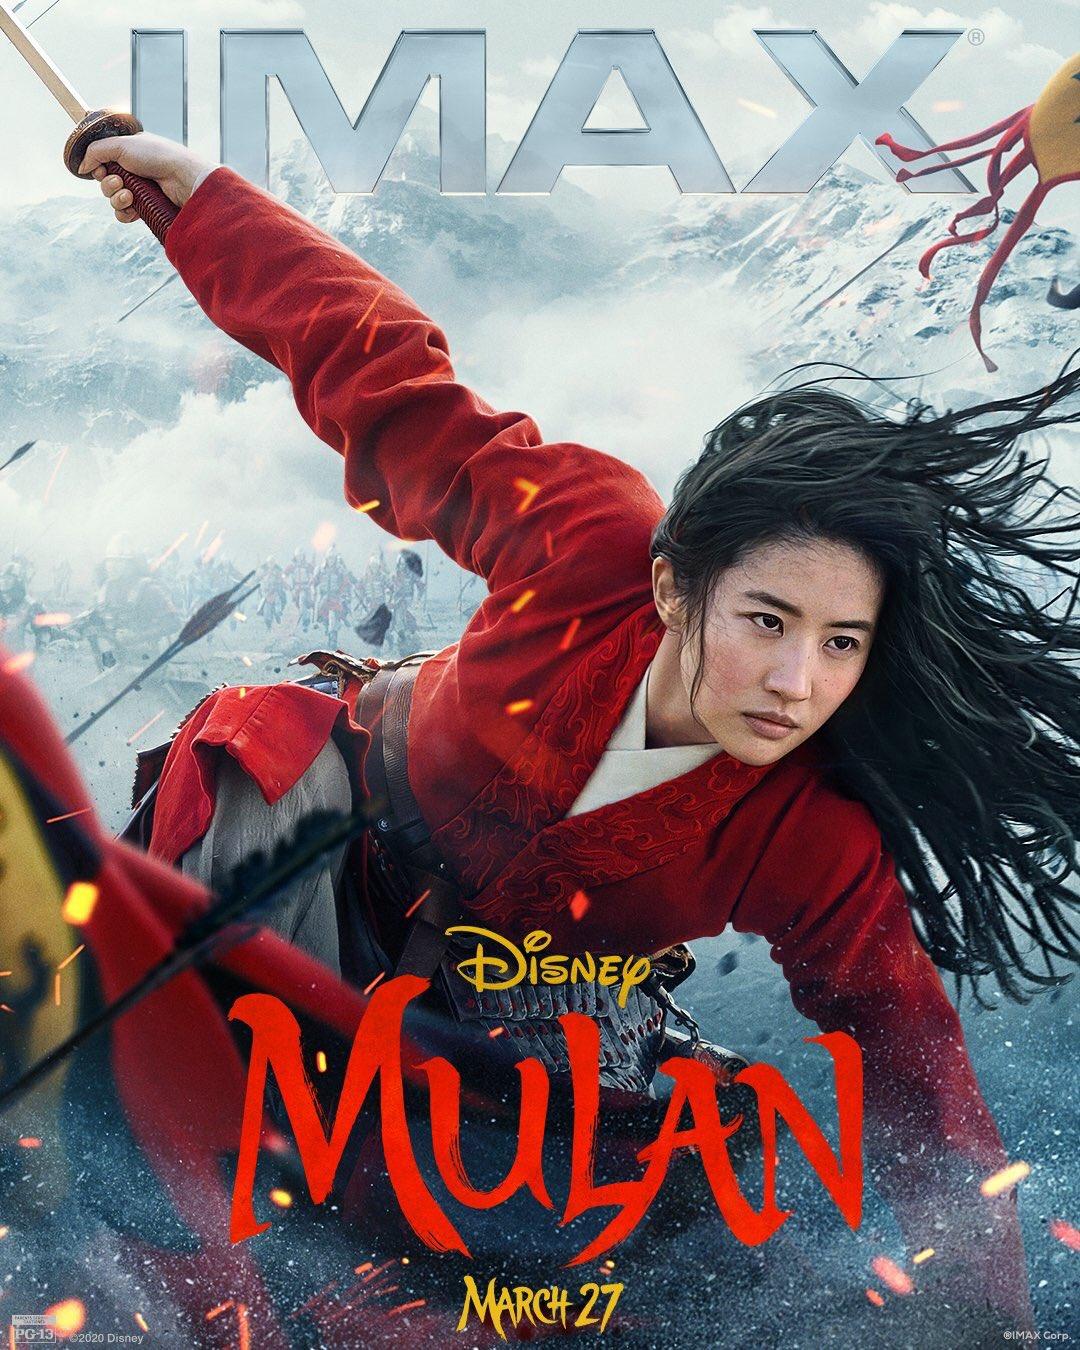 Mulan [Disney - 2020] - Page 16 ERy4QsrWkAE7V8V?format=jpg&name=large